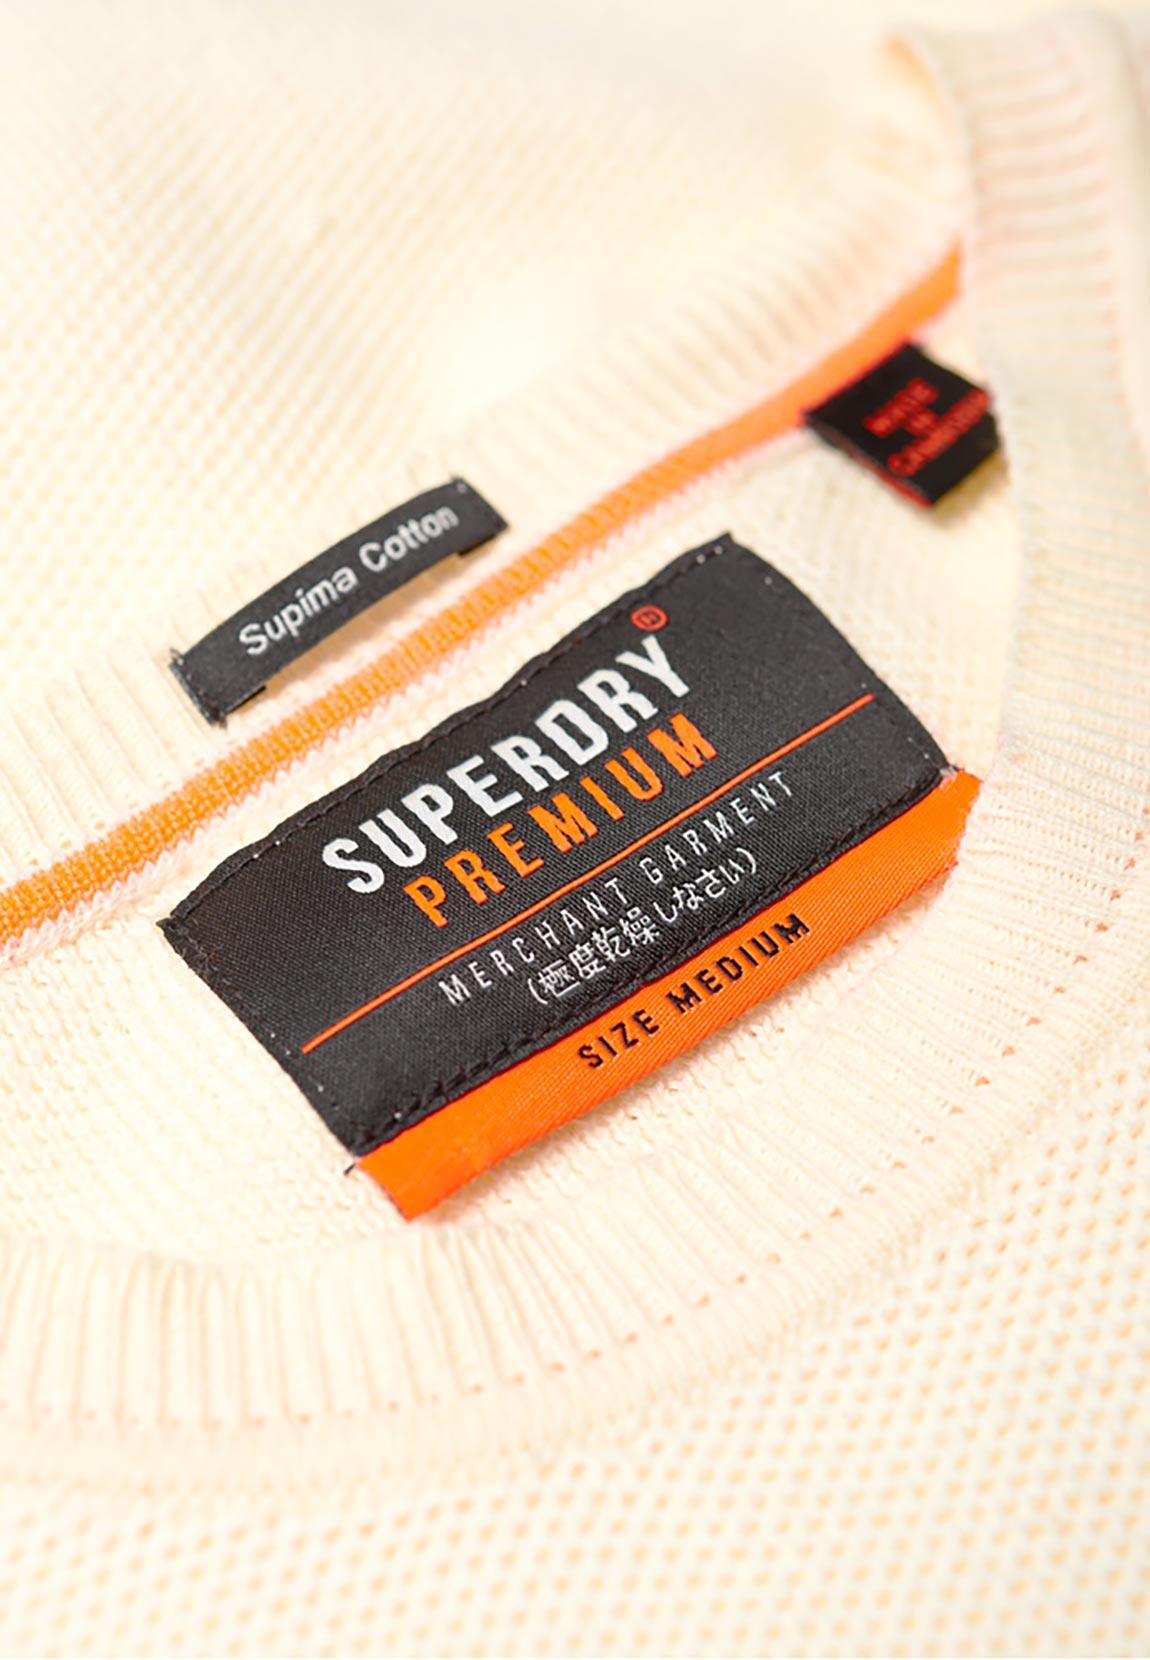 Details about Superdry Sweater Men's Supima Cotton Crew Cloud